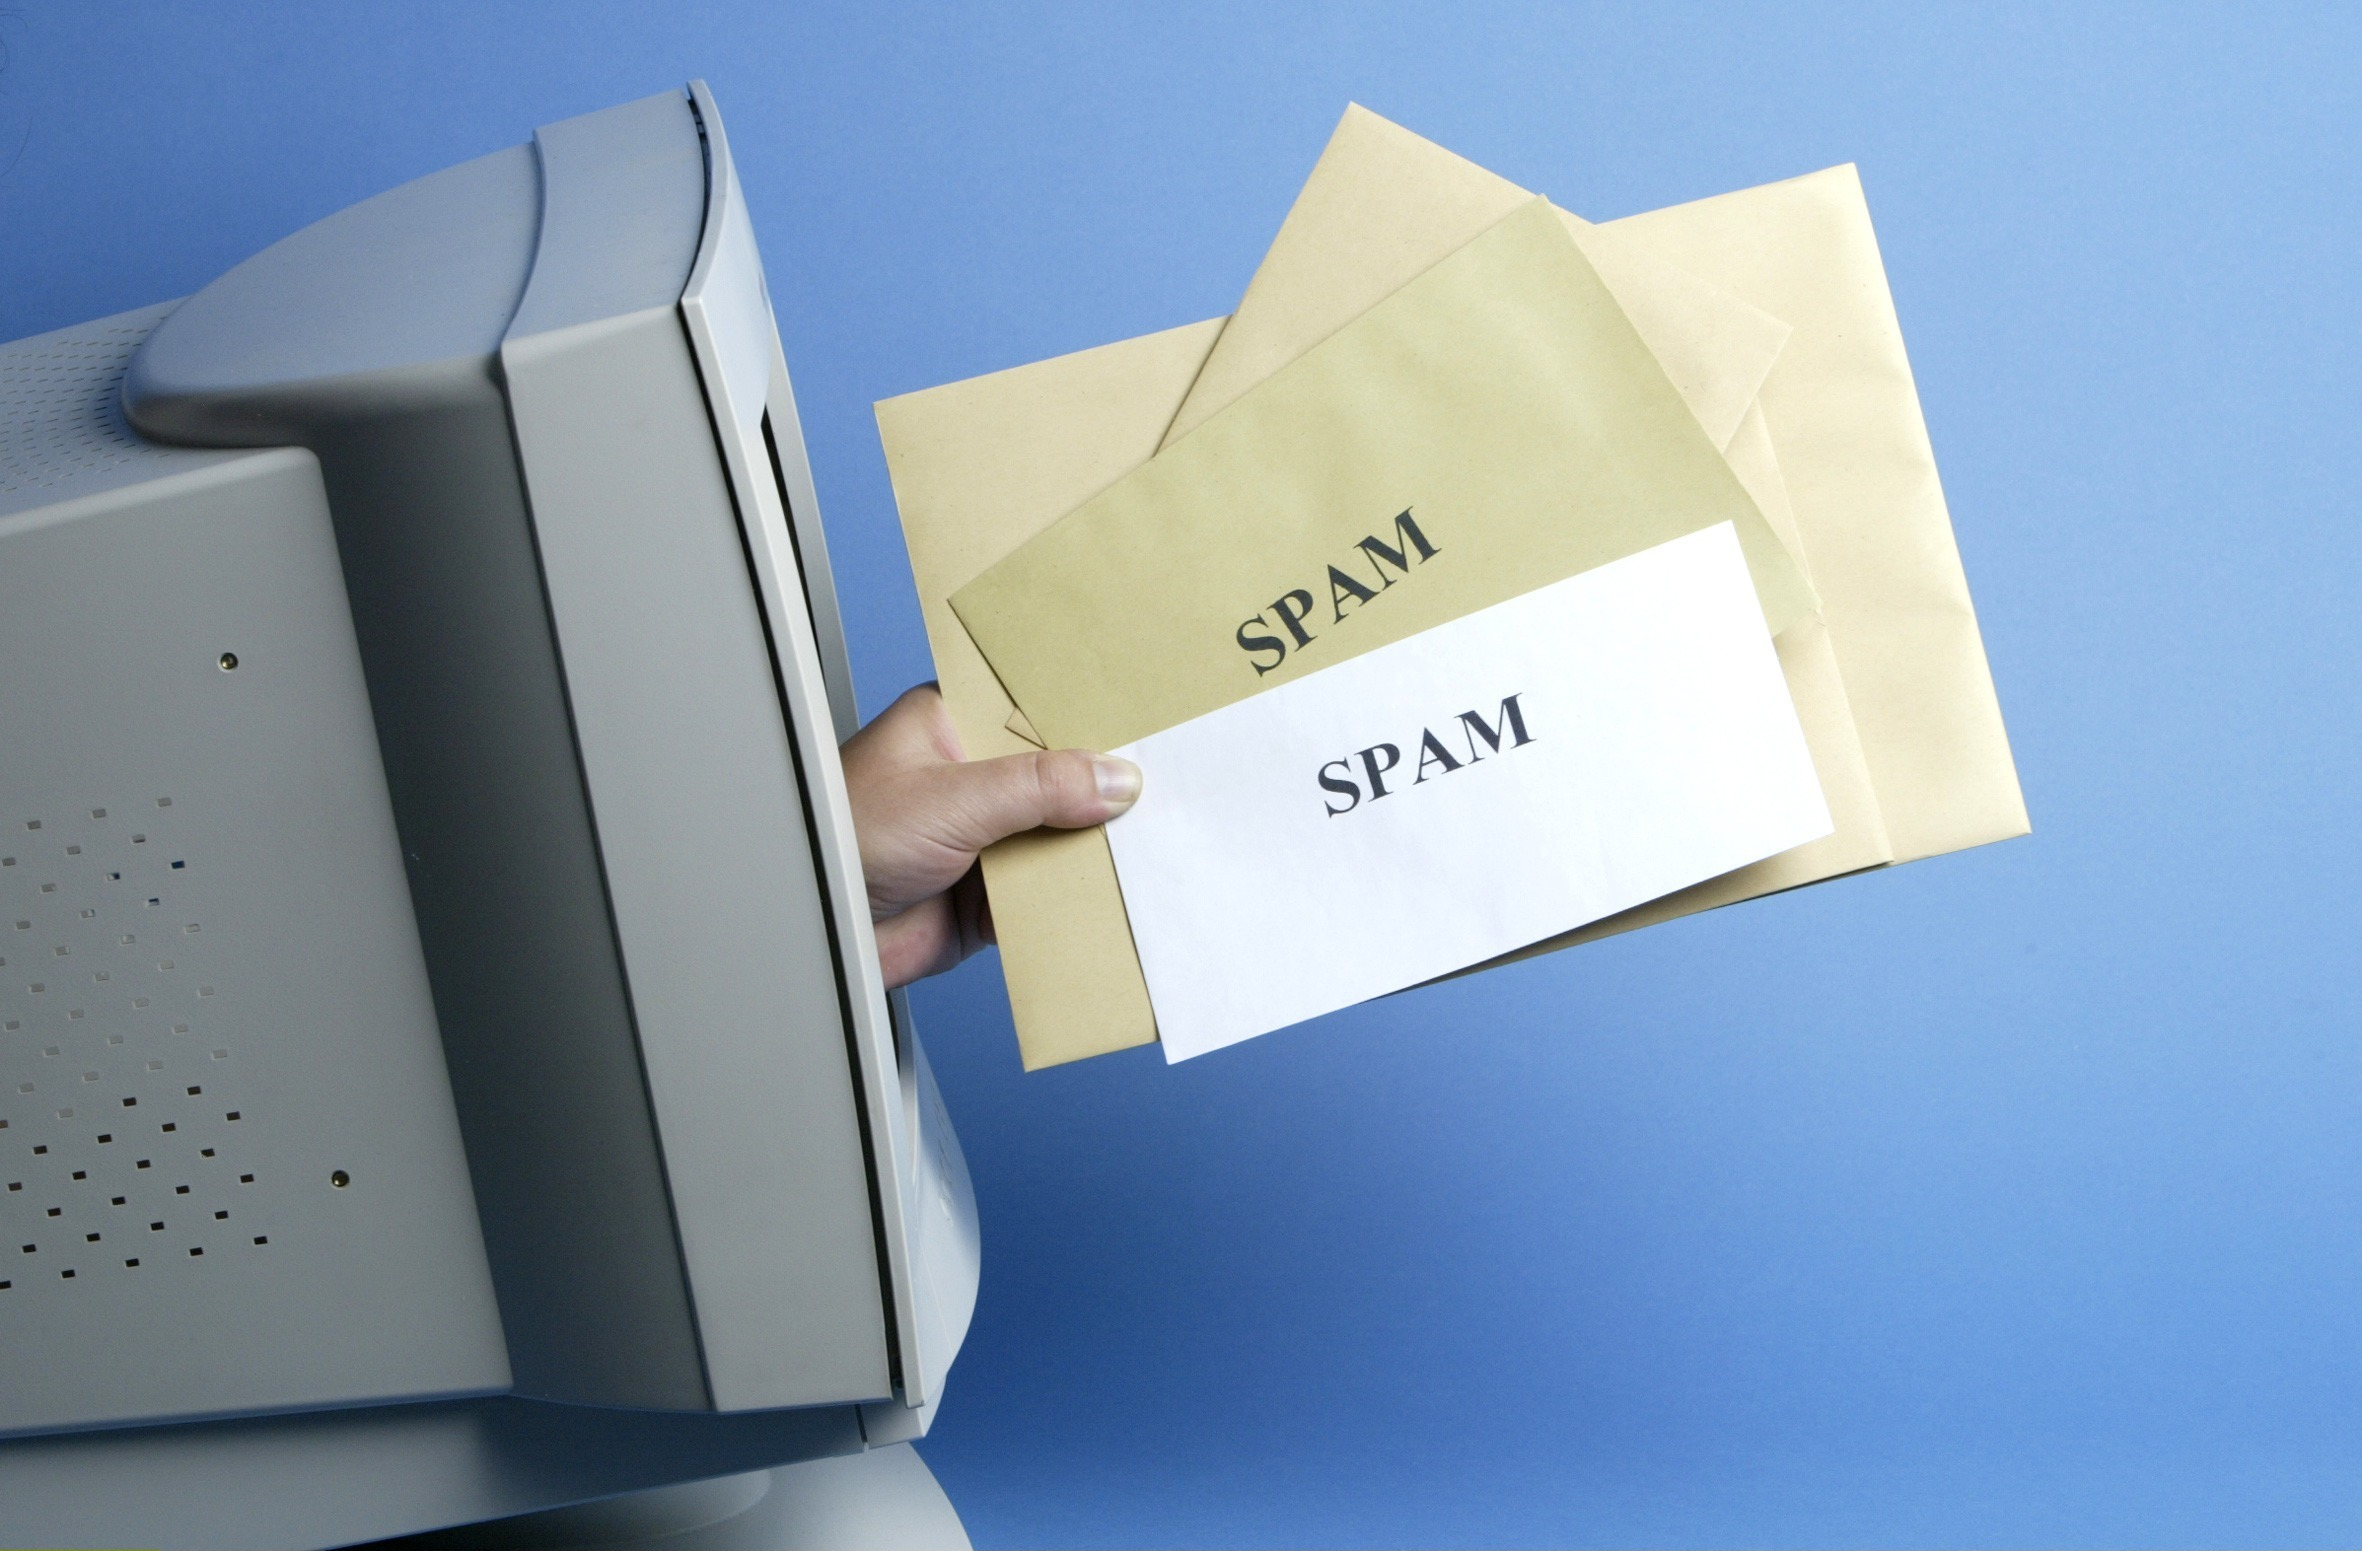 Symbol E-Mail Spam